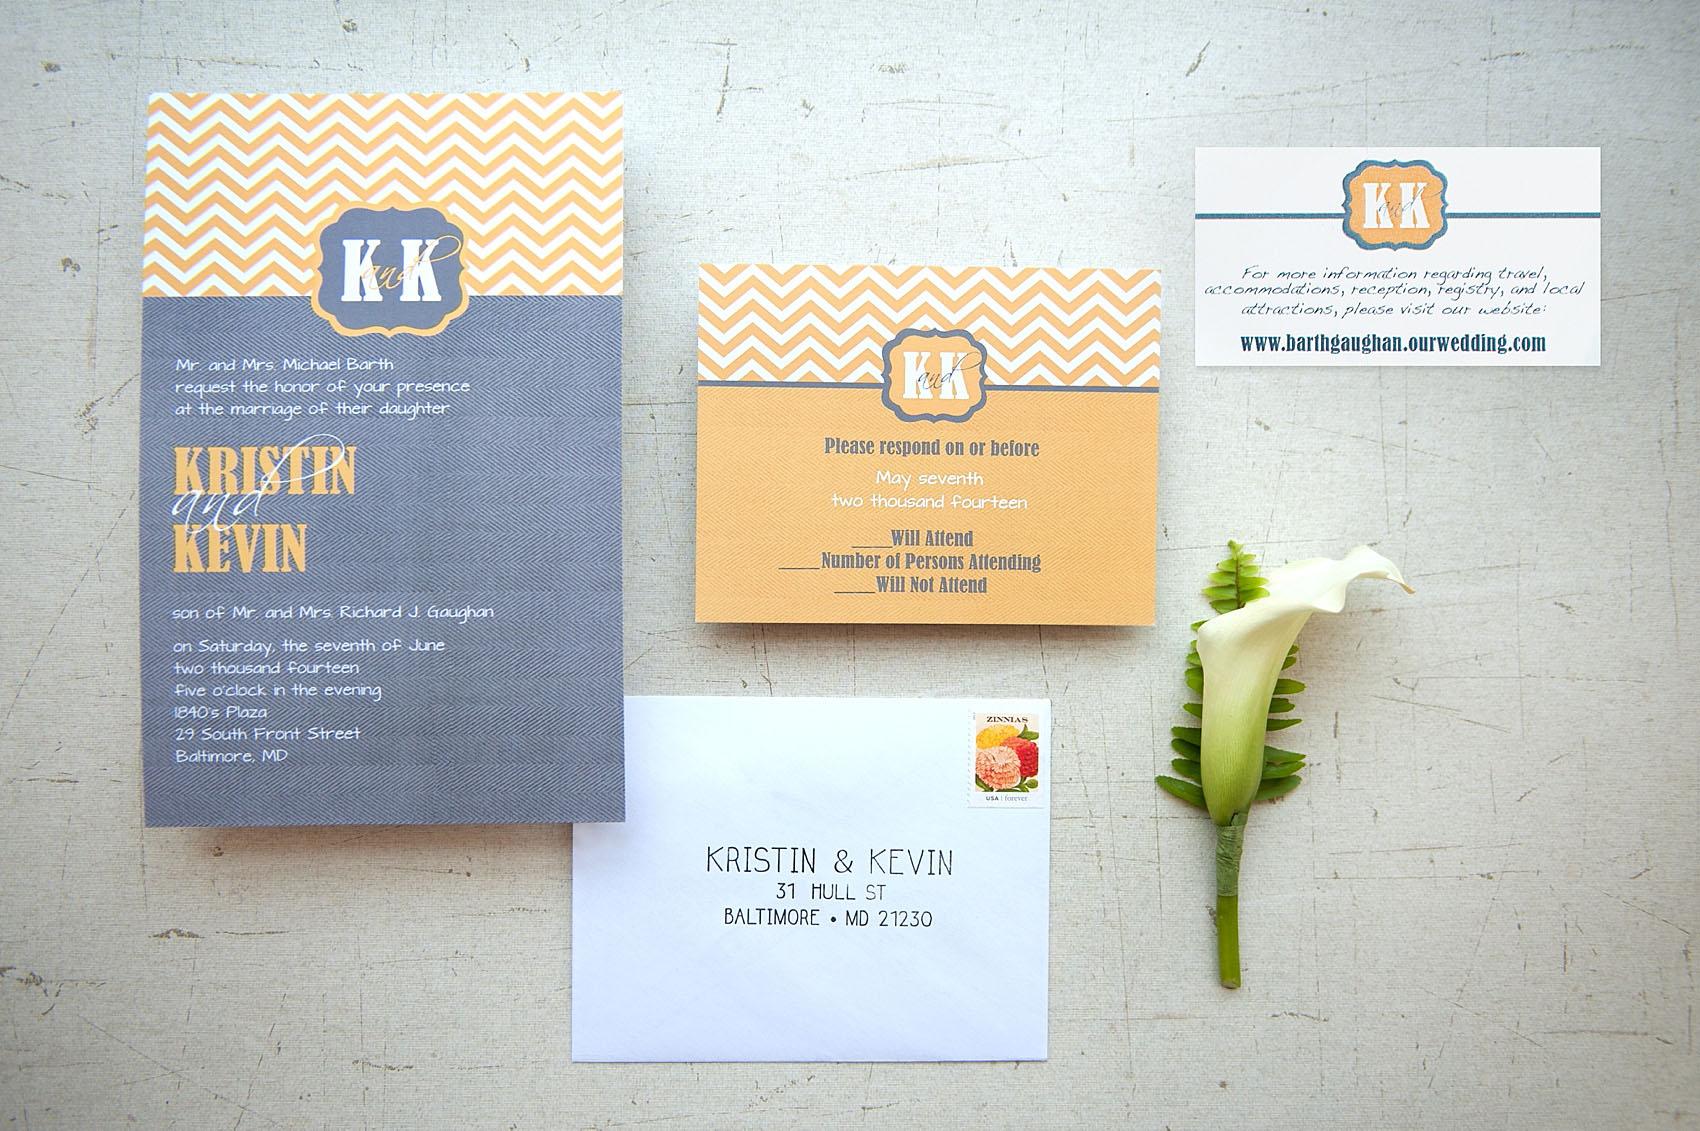 Wedding Invitations In Maryland: Grey & Orange 1840s Ballroom Wedding • Kristin + Kevin